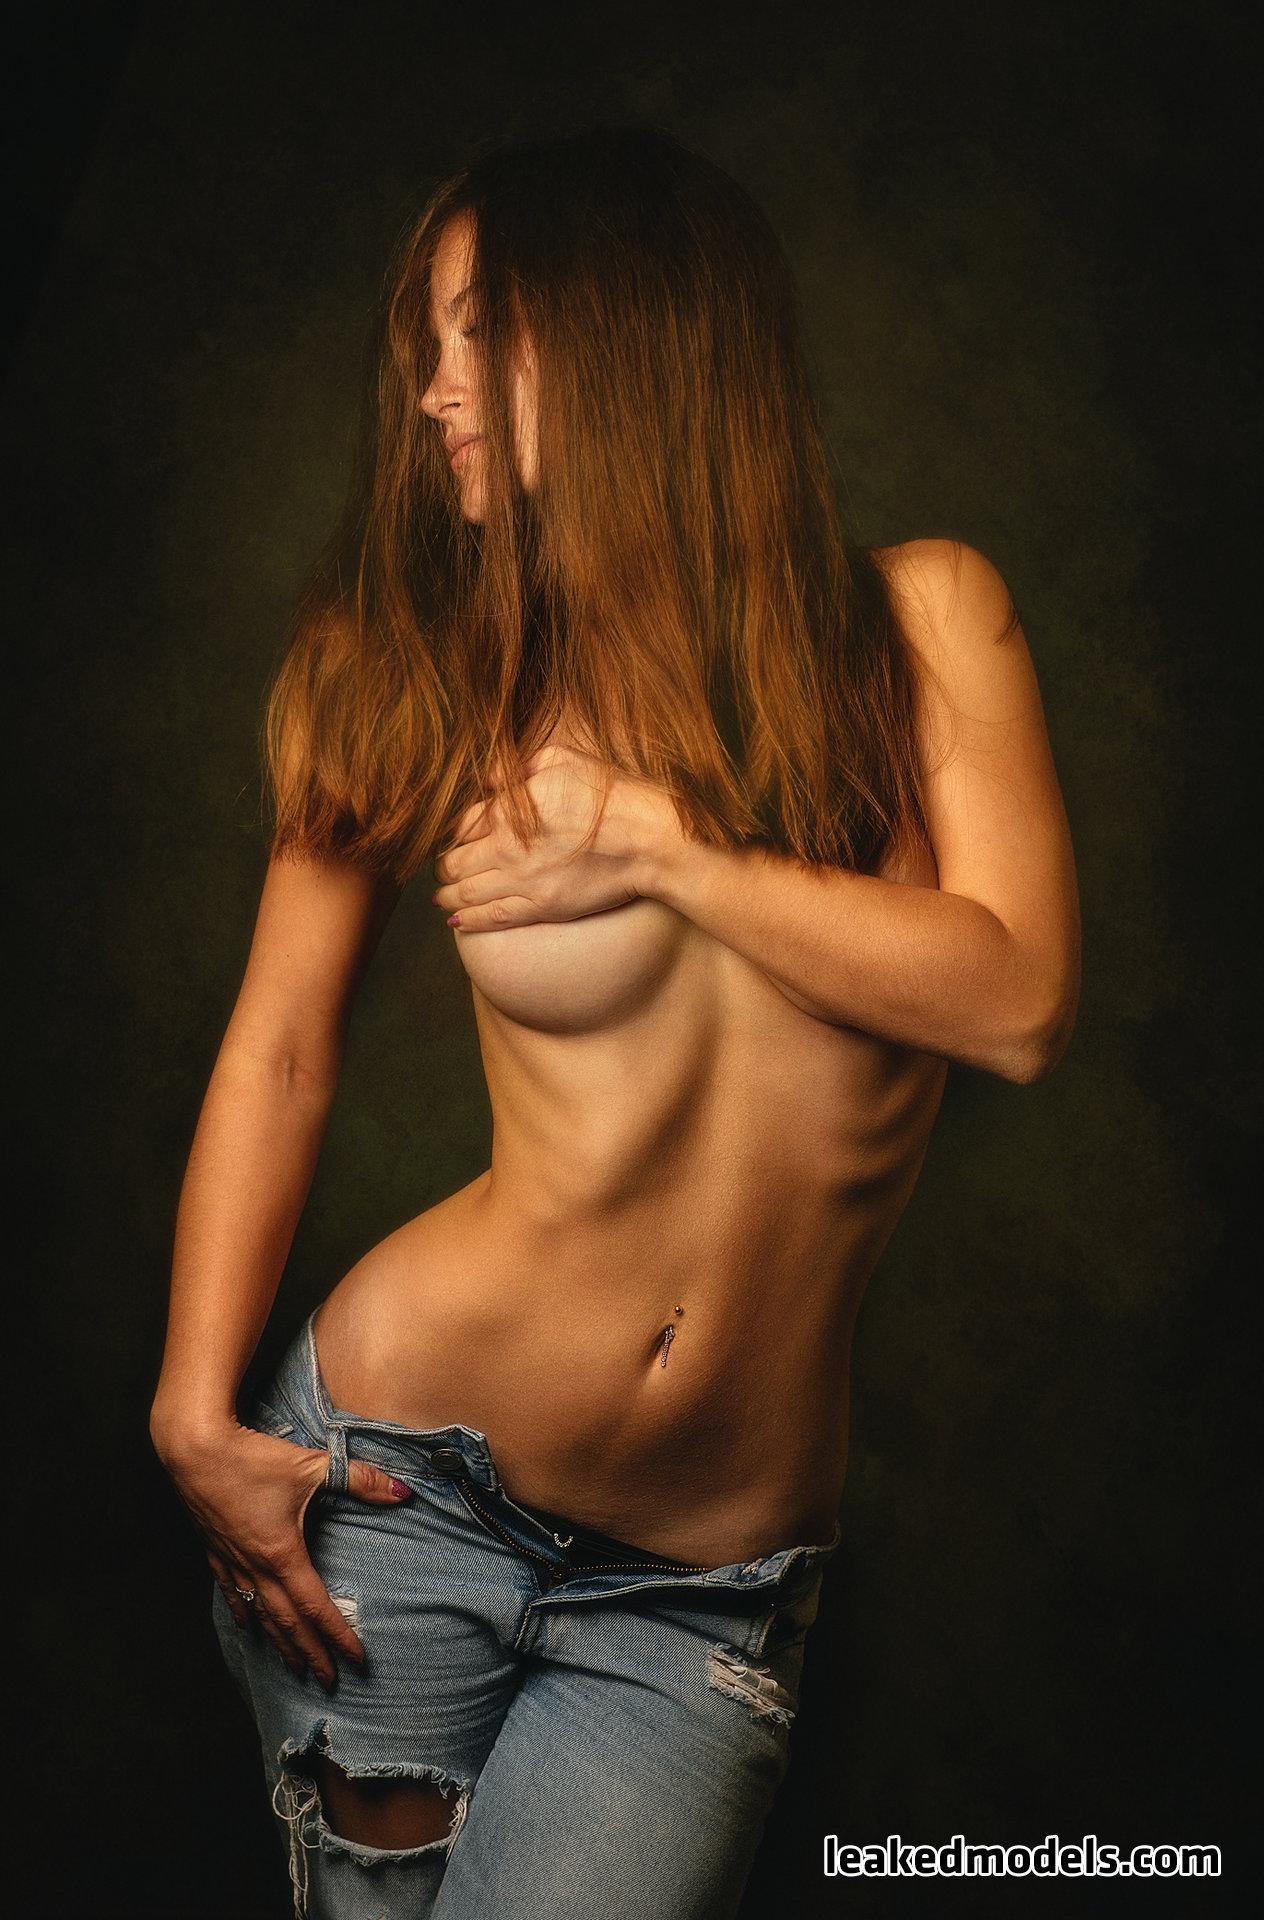 Yulia Sergeevna Kalnitskaya – juli55555 Instagram Nude Leaks (25 Photos)